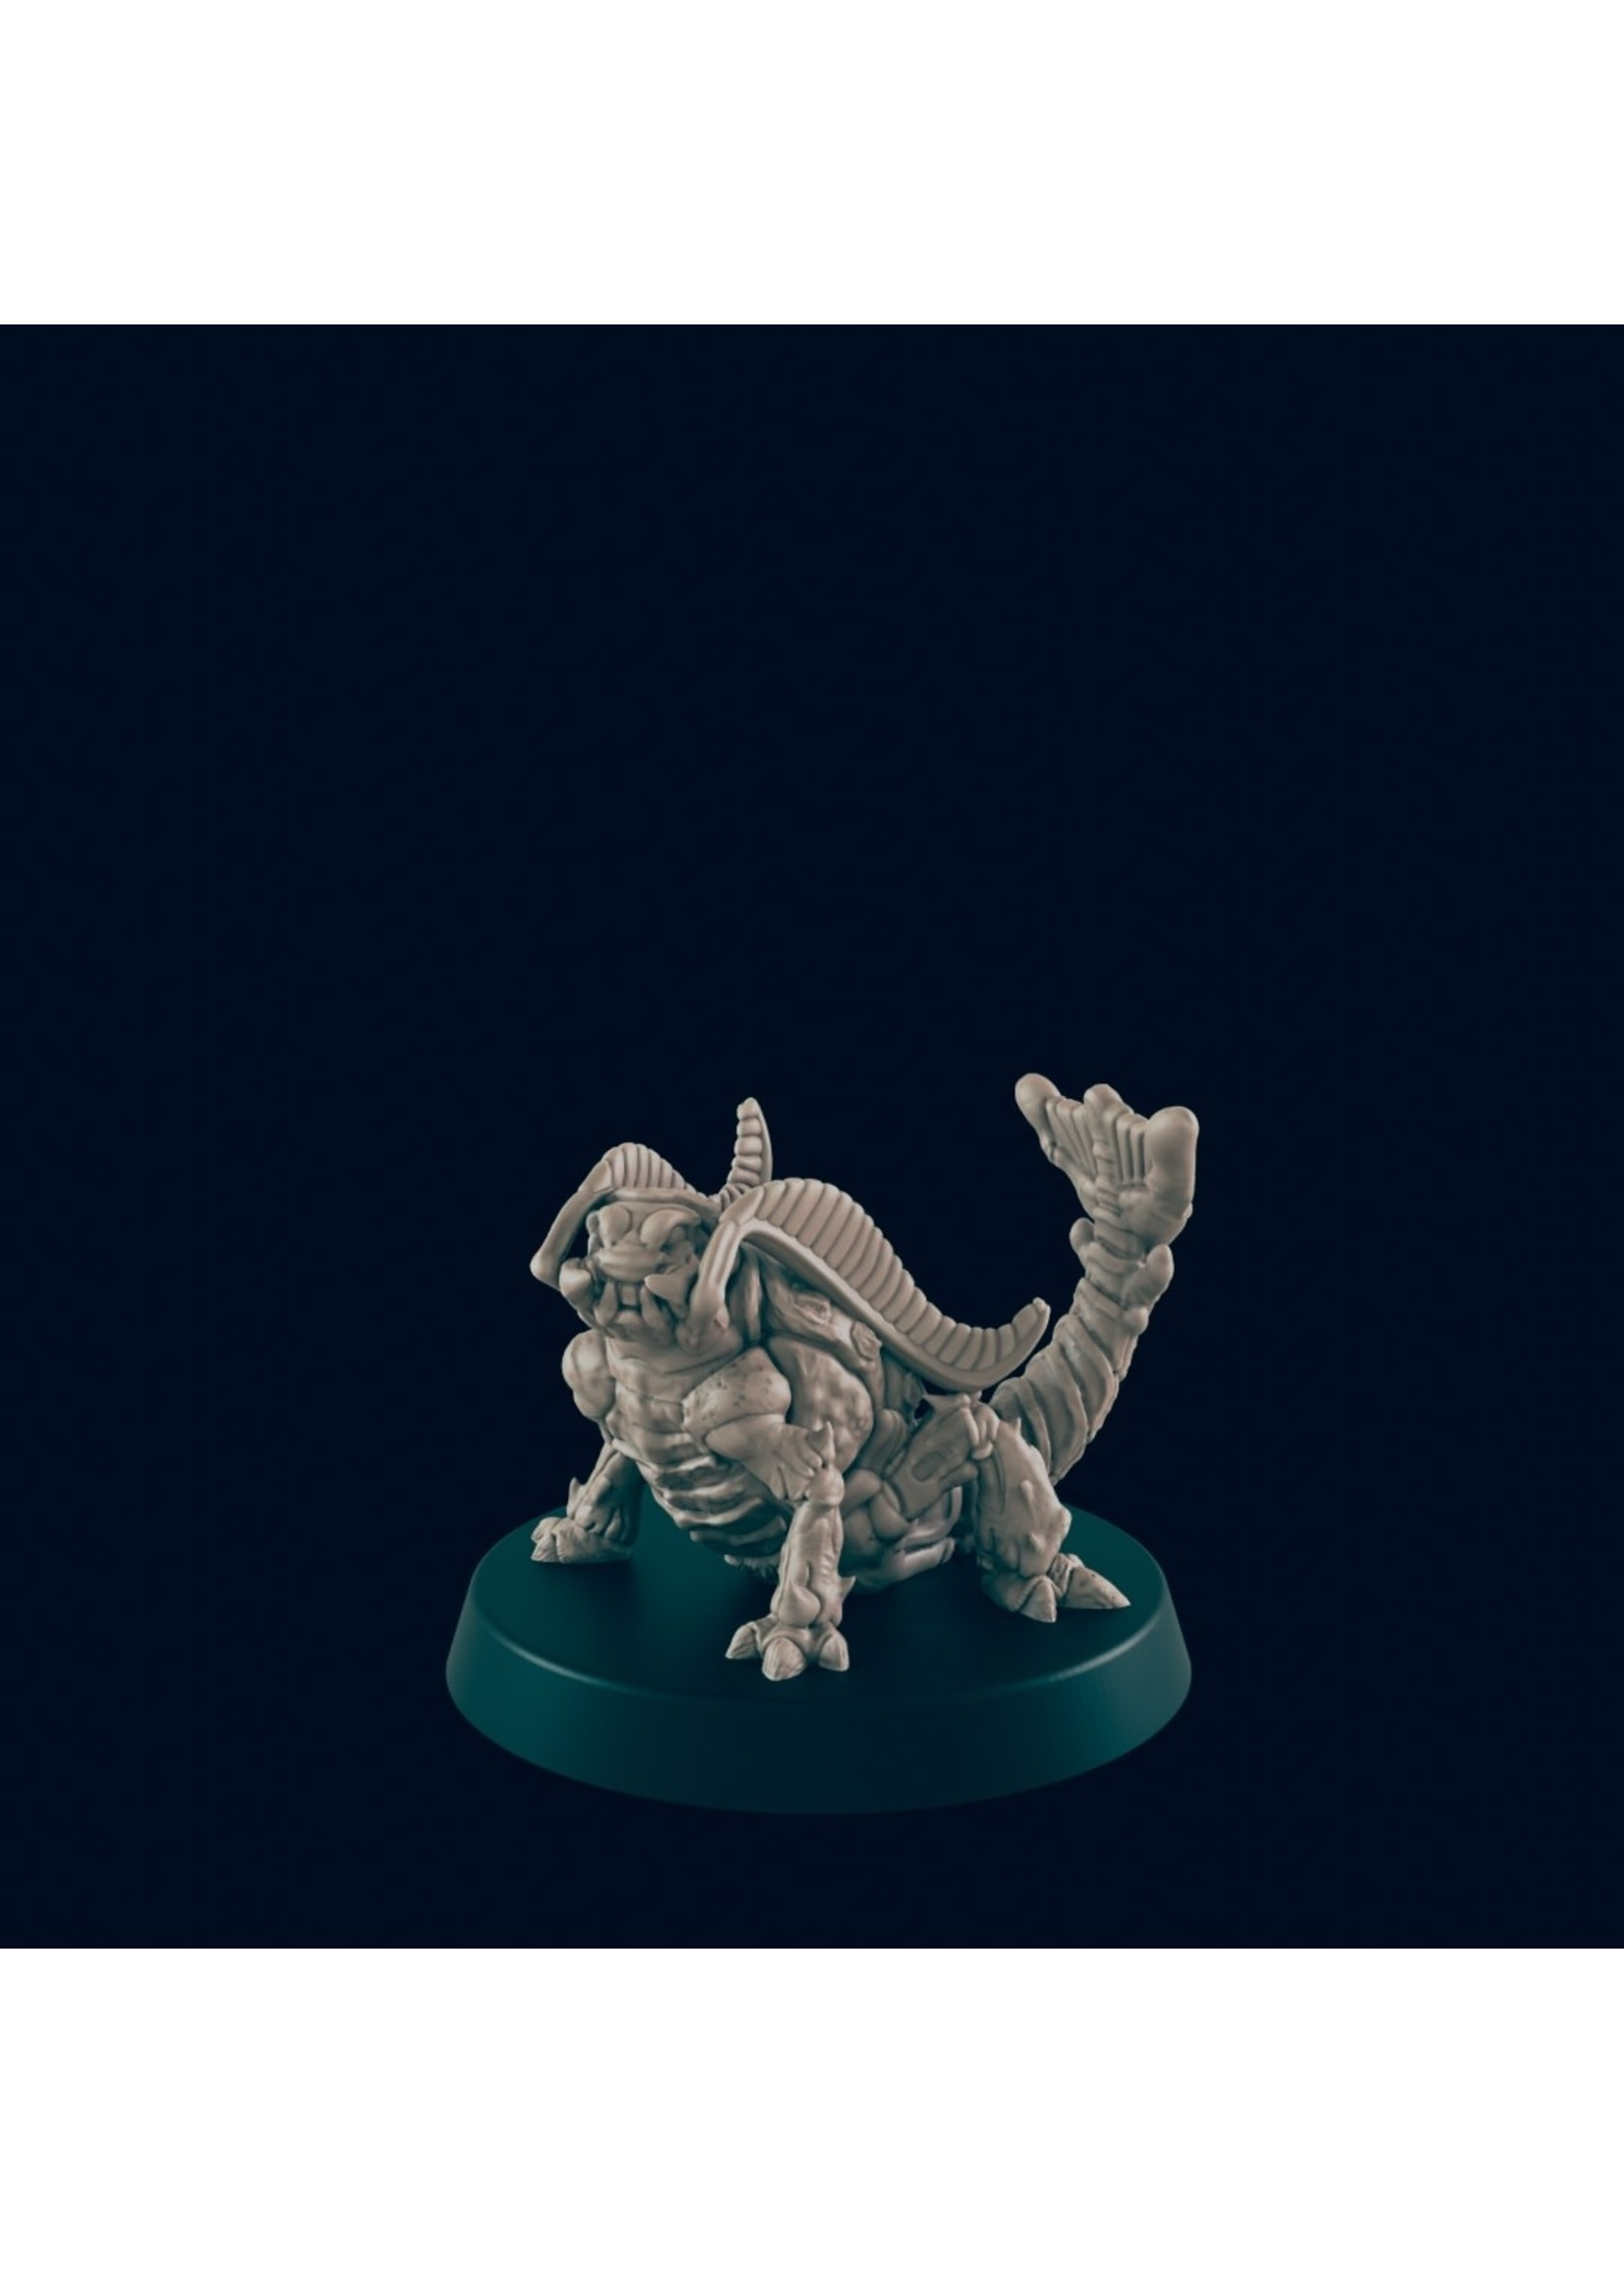 3D Printed Miniature - Rust Monster - Dungeons & Dragons - Beasts and Baddies KS